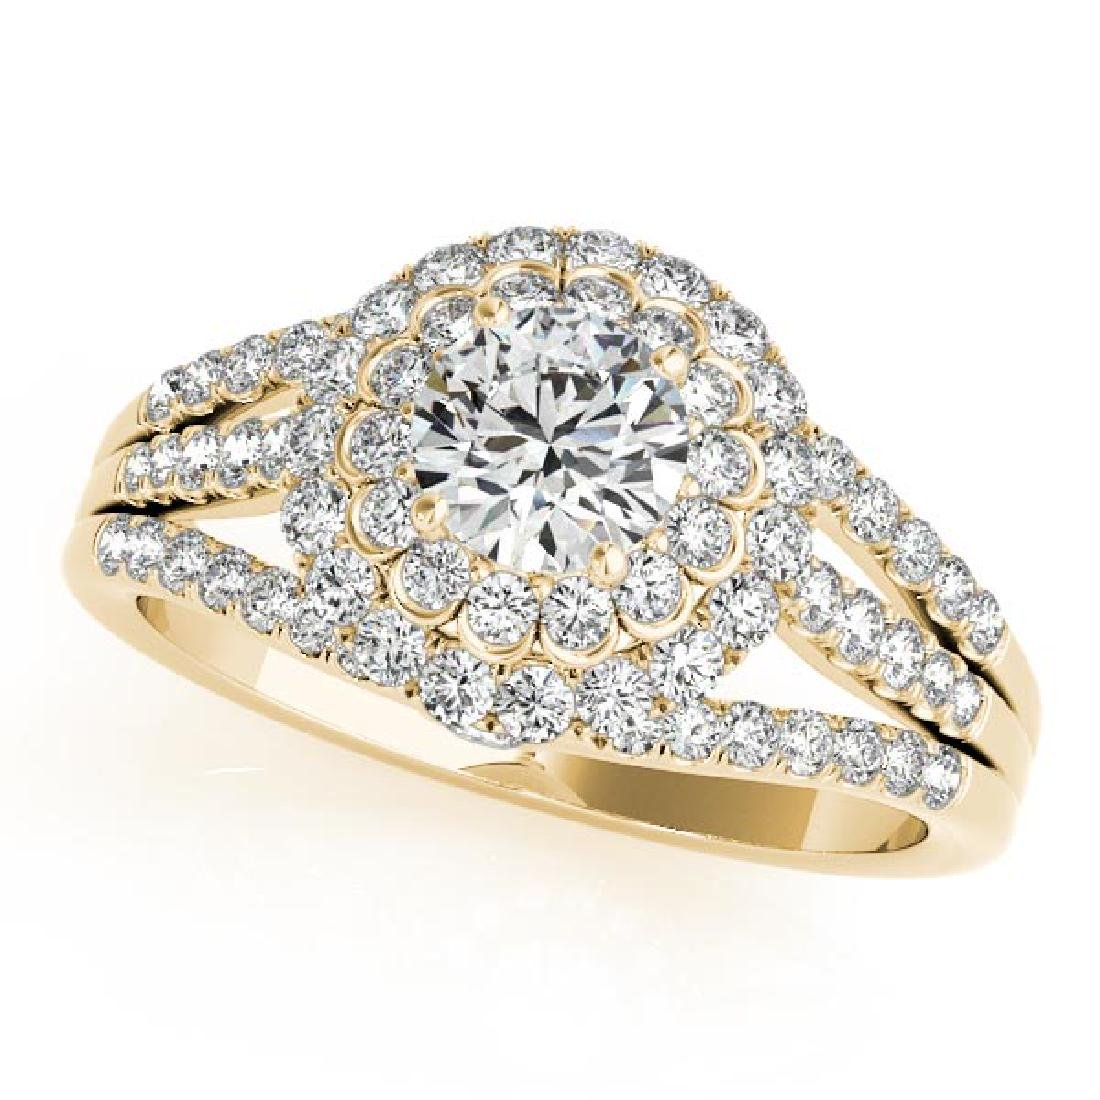 CERTIFIED 18K YELLOW GOLD 1.61 CT G-H/VS-SI1 DIAMOND HA